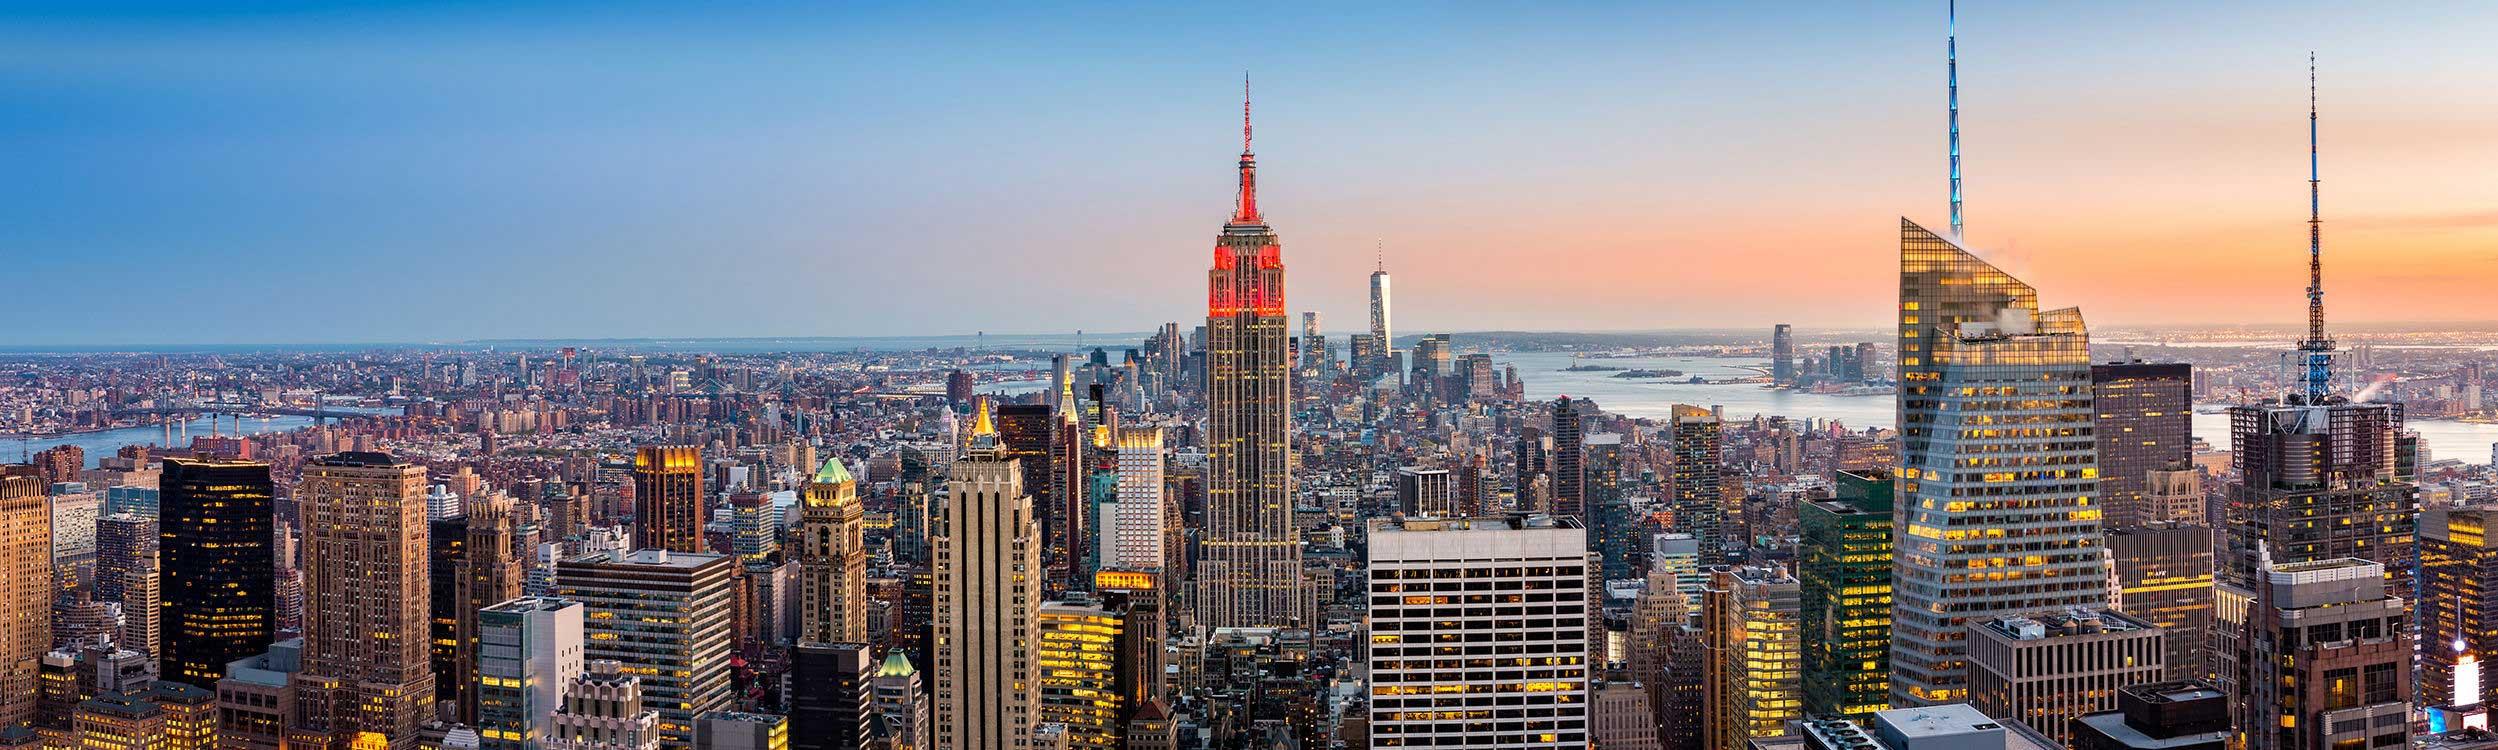 new york ville touristique vacances arts guides voyages. Black Bedroom Furniture Sets. Home Design Ideas